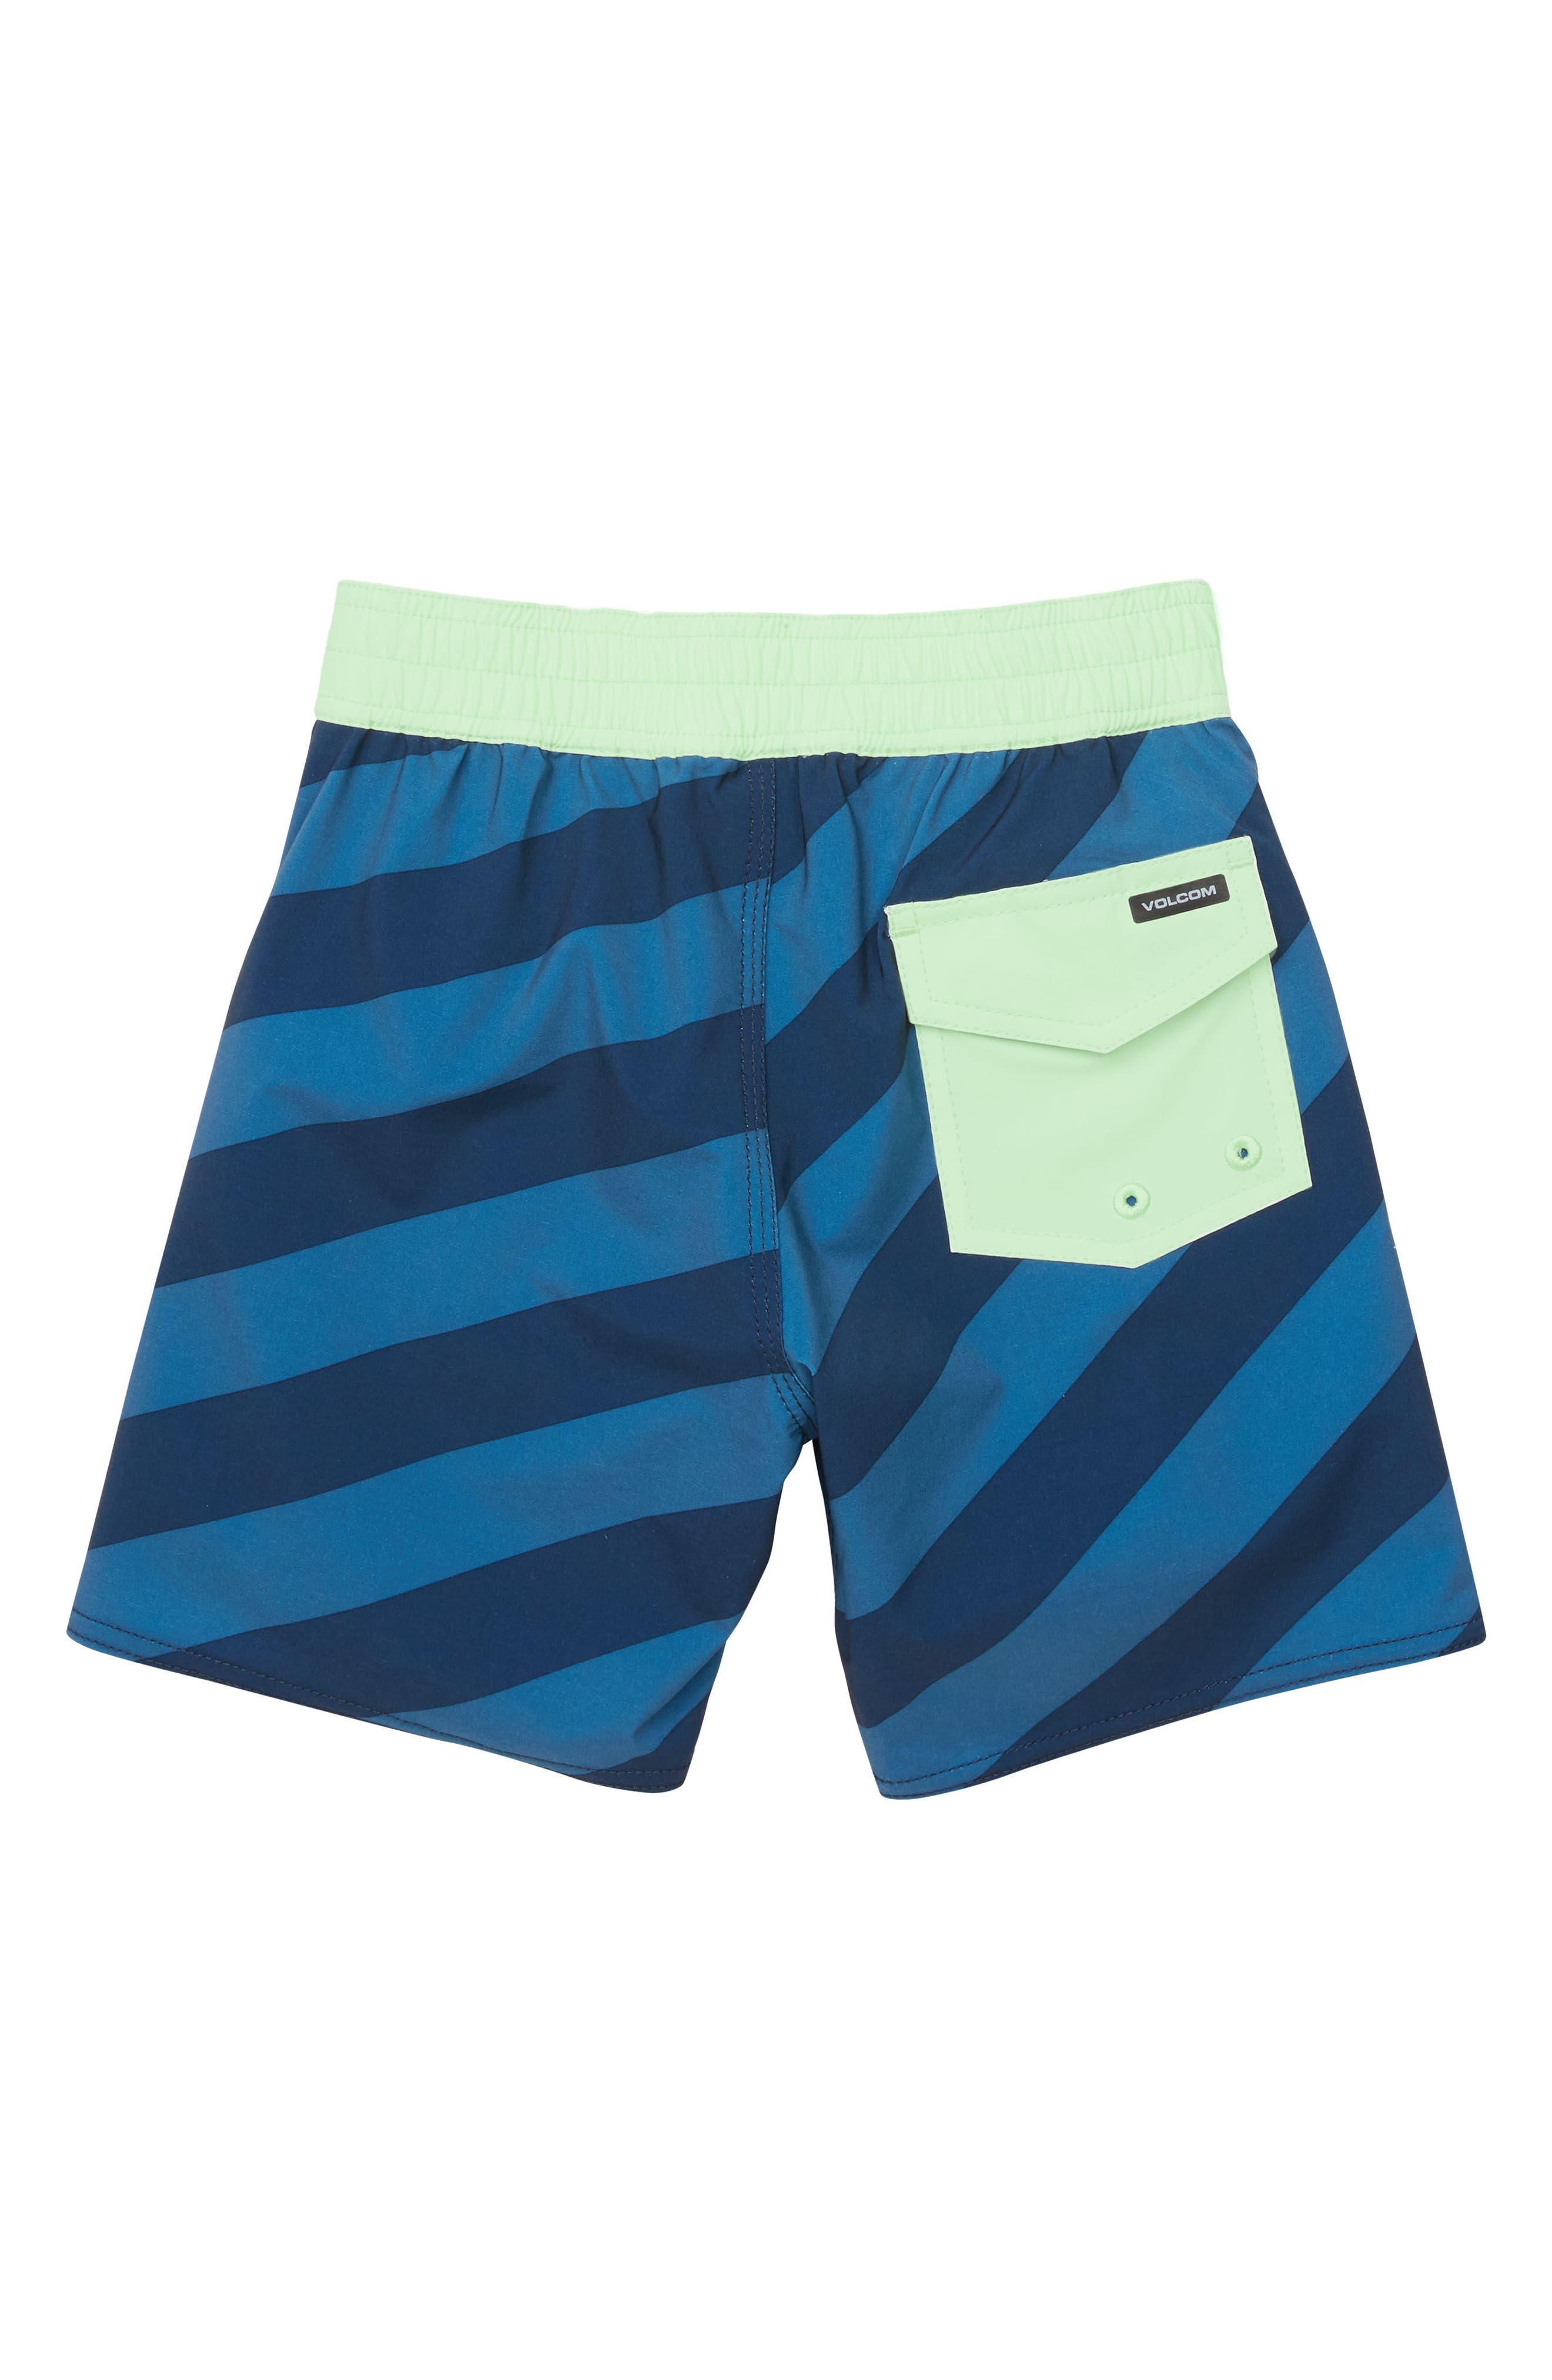 Stripey Board Shorts,                             Alternate thumbnail 2, color,                             INDIGO